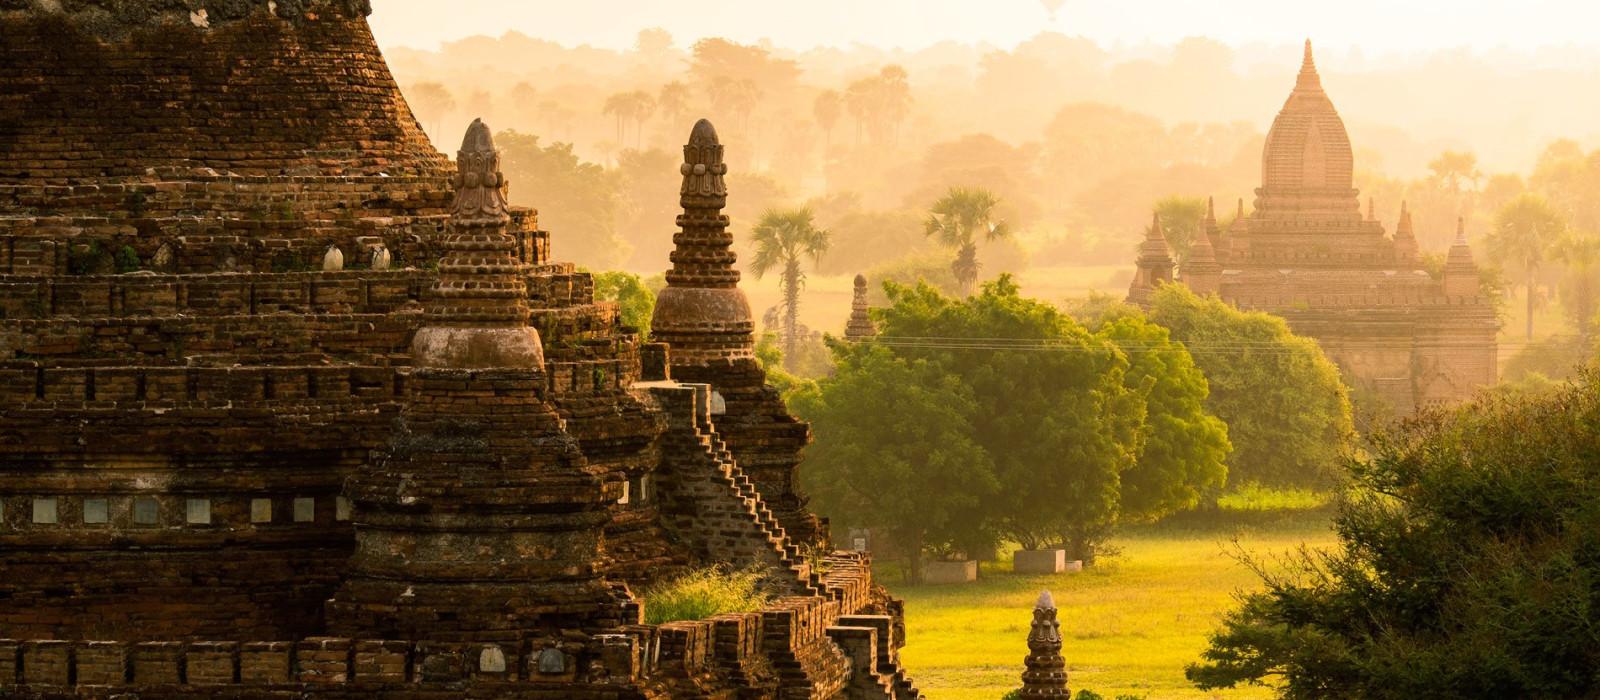 Reiseziel Bagan / Ayeyarwady Myanmar